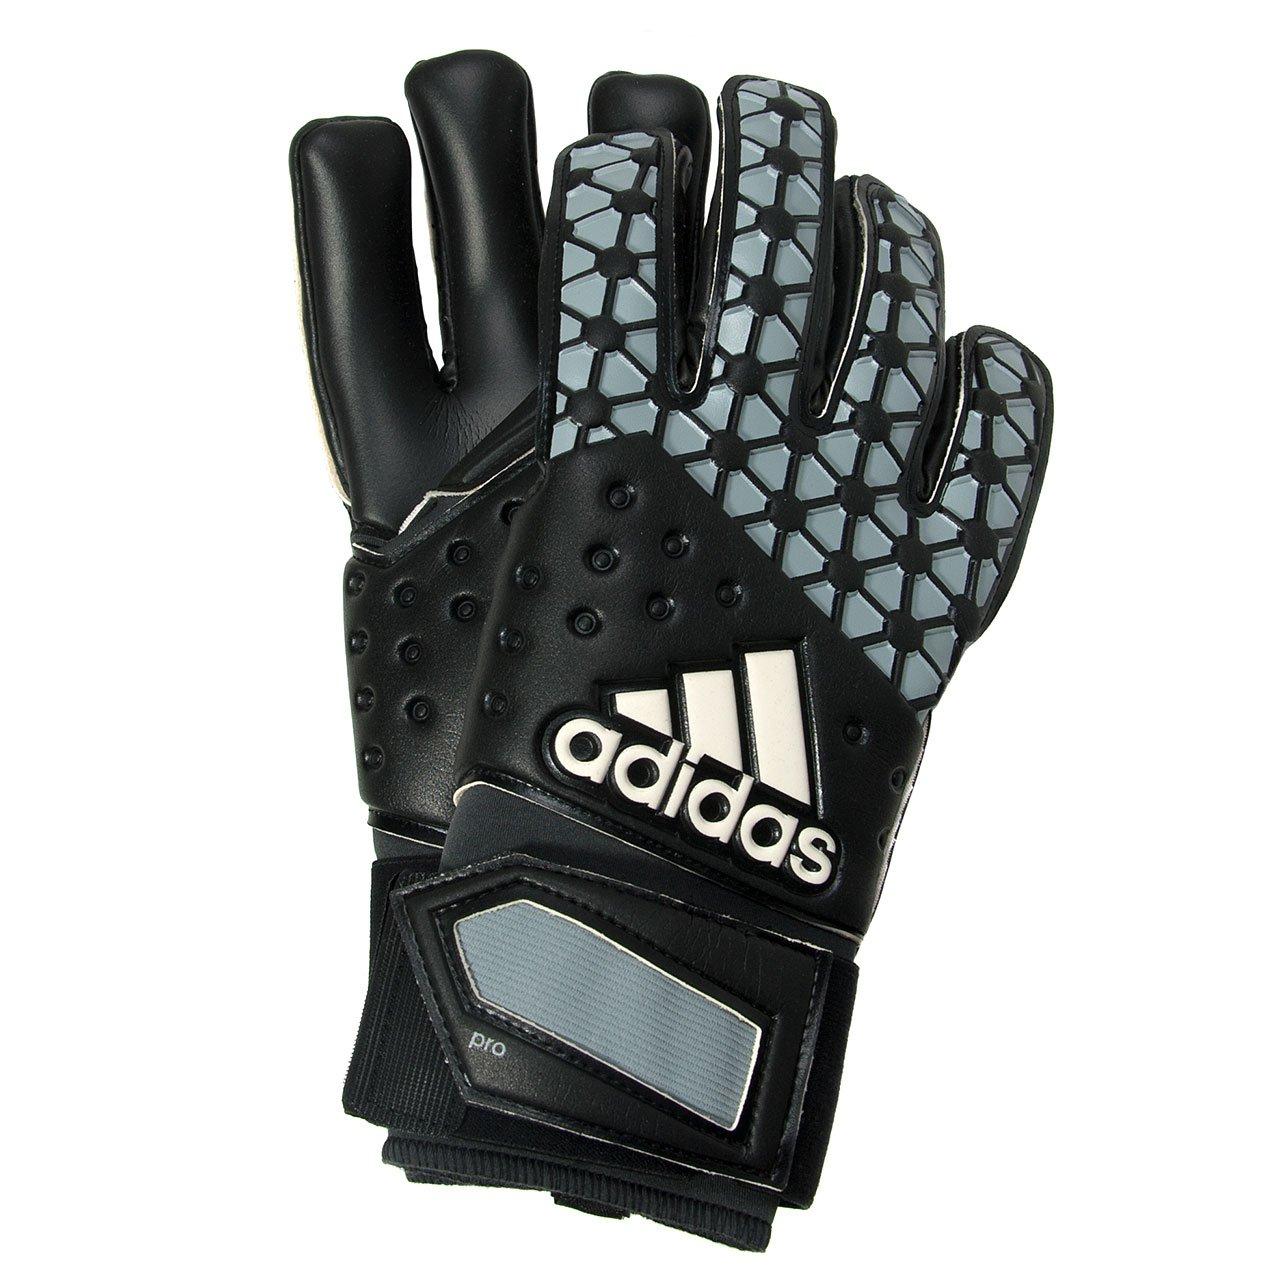 Adidas Erwachsene Torwarthandschuhe Ace Pro Classic